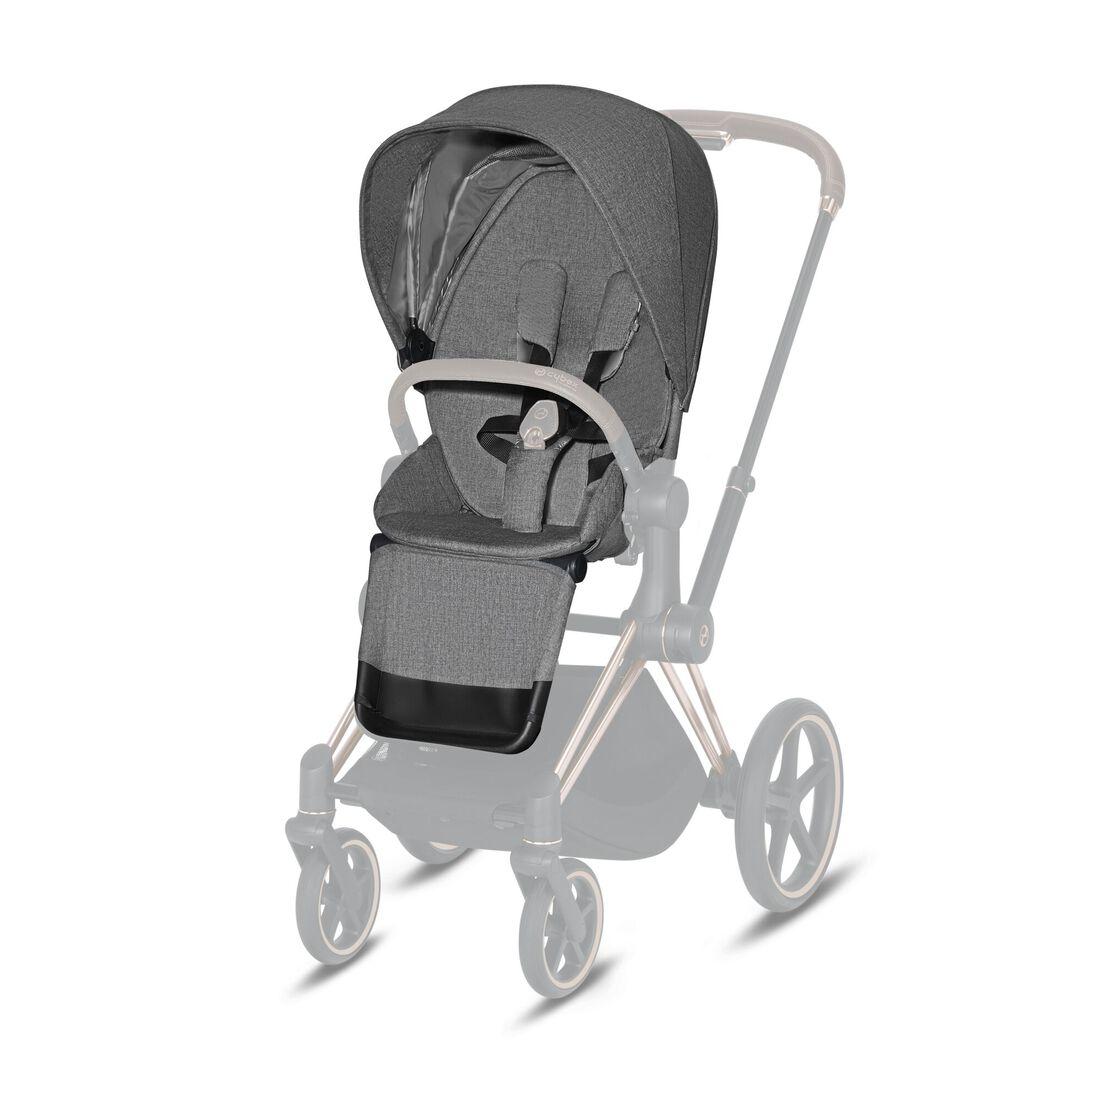 CYBEX Priam Seat Pack - Manhattan Grey Plus in Manhattan Grey Plus large image number 1